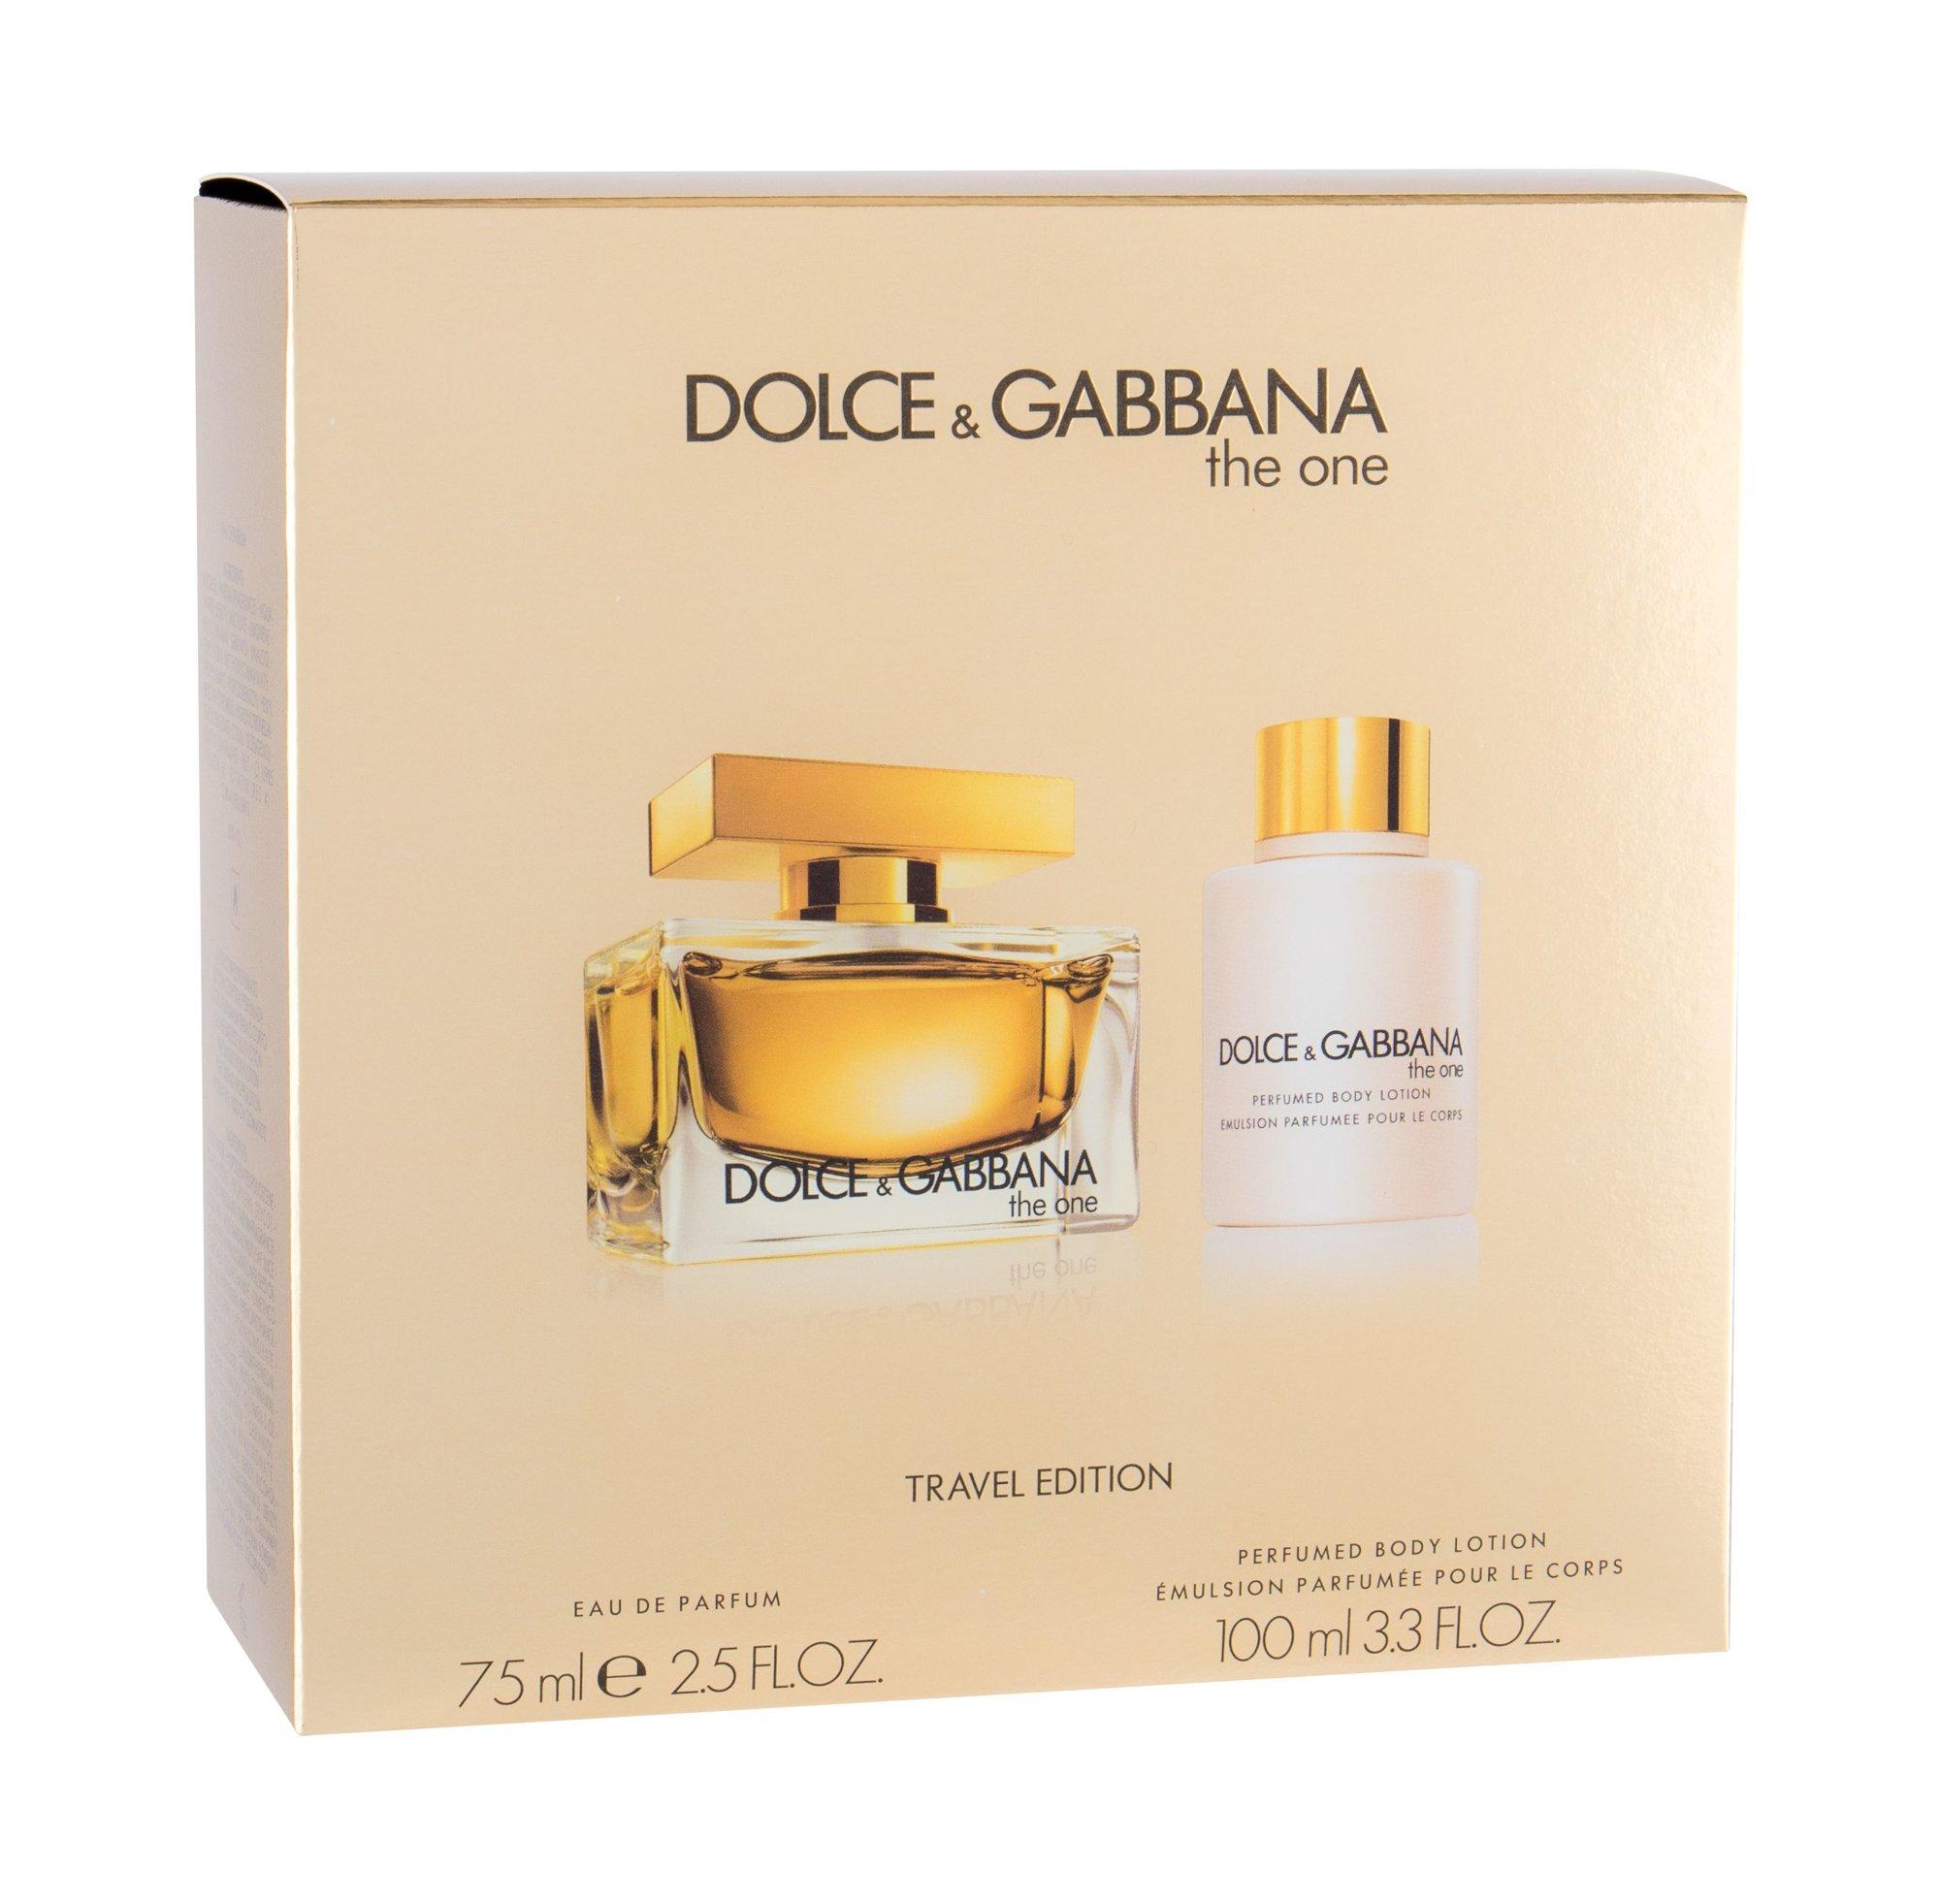 Dolce&Gabbana The One Eau de Parfum 75ml